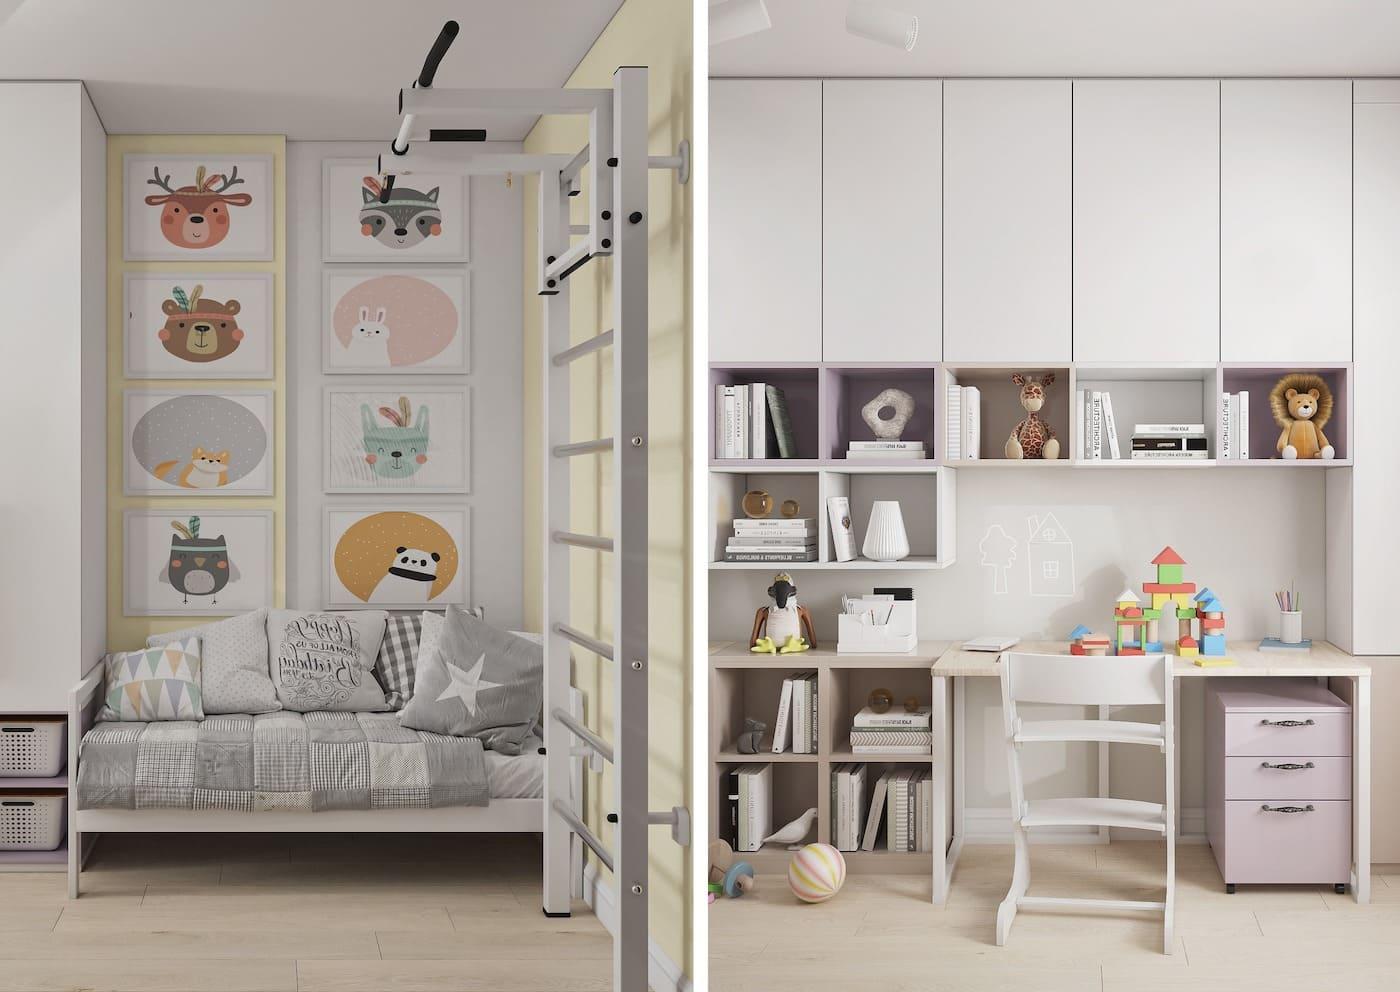 интерьер детской комнаты фото 32